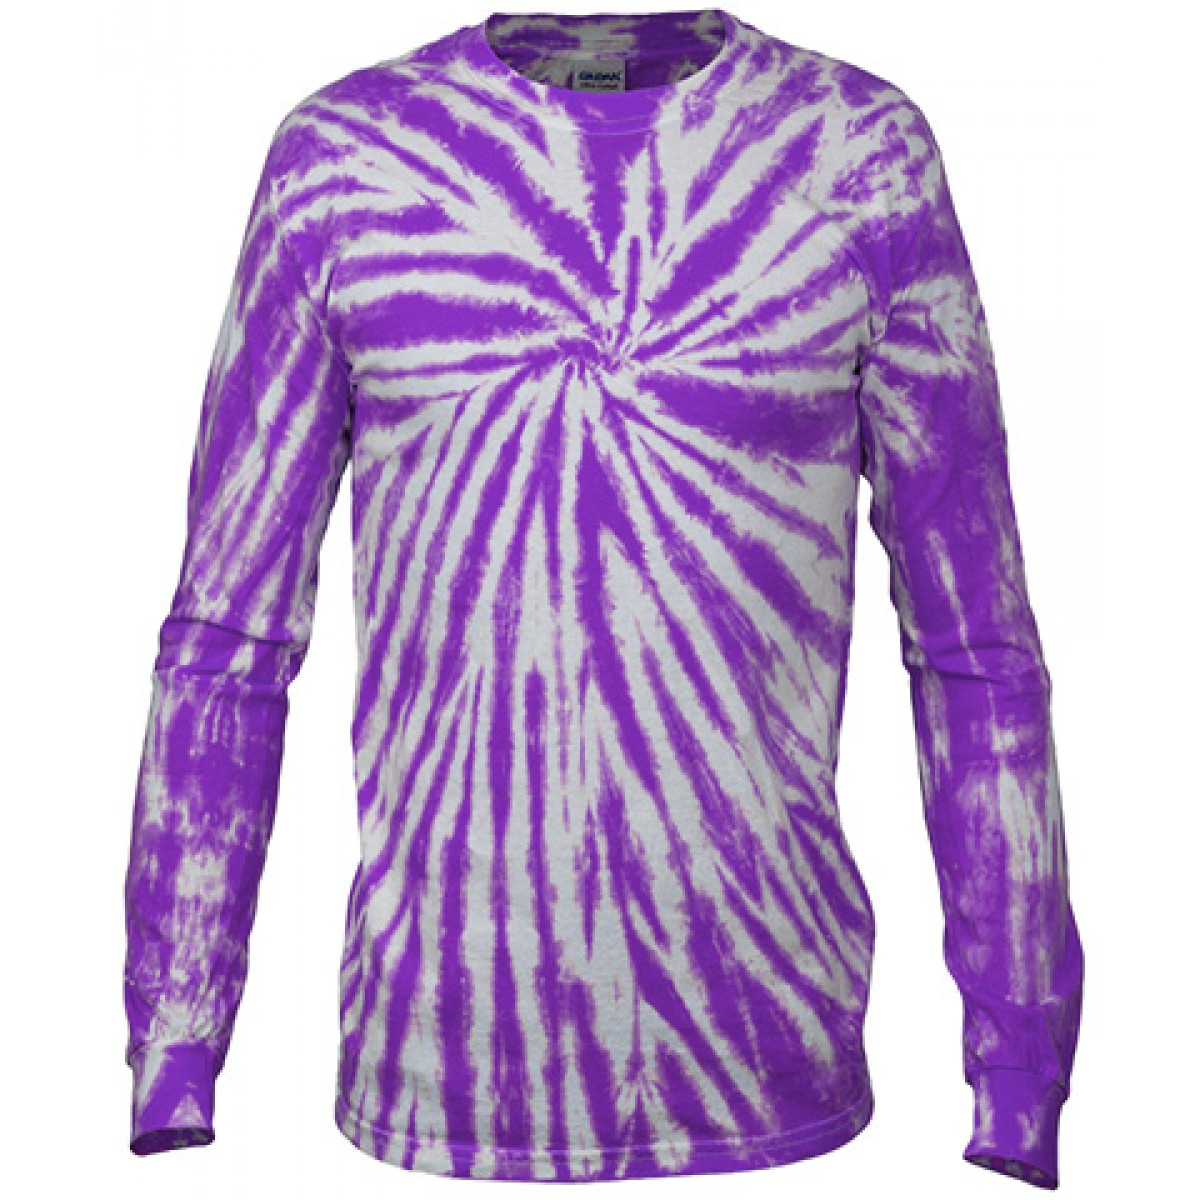 Multi Color Tie-Dye Long Sleeve Shirt -Fuscia-YM